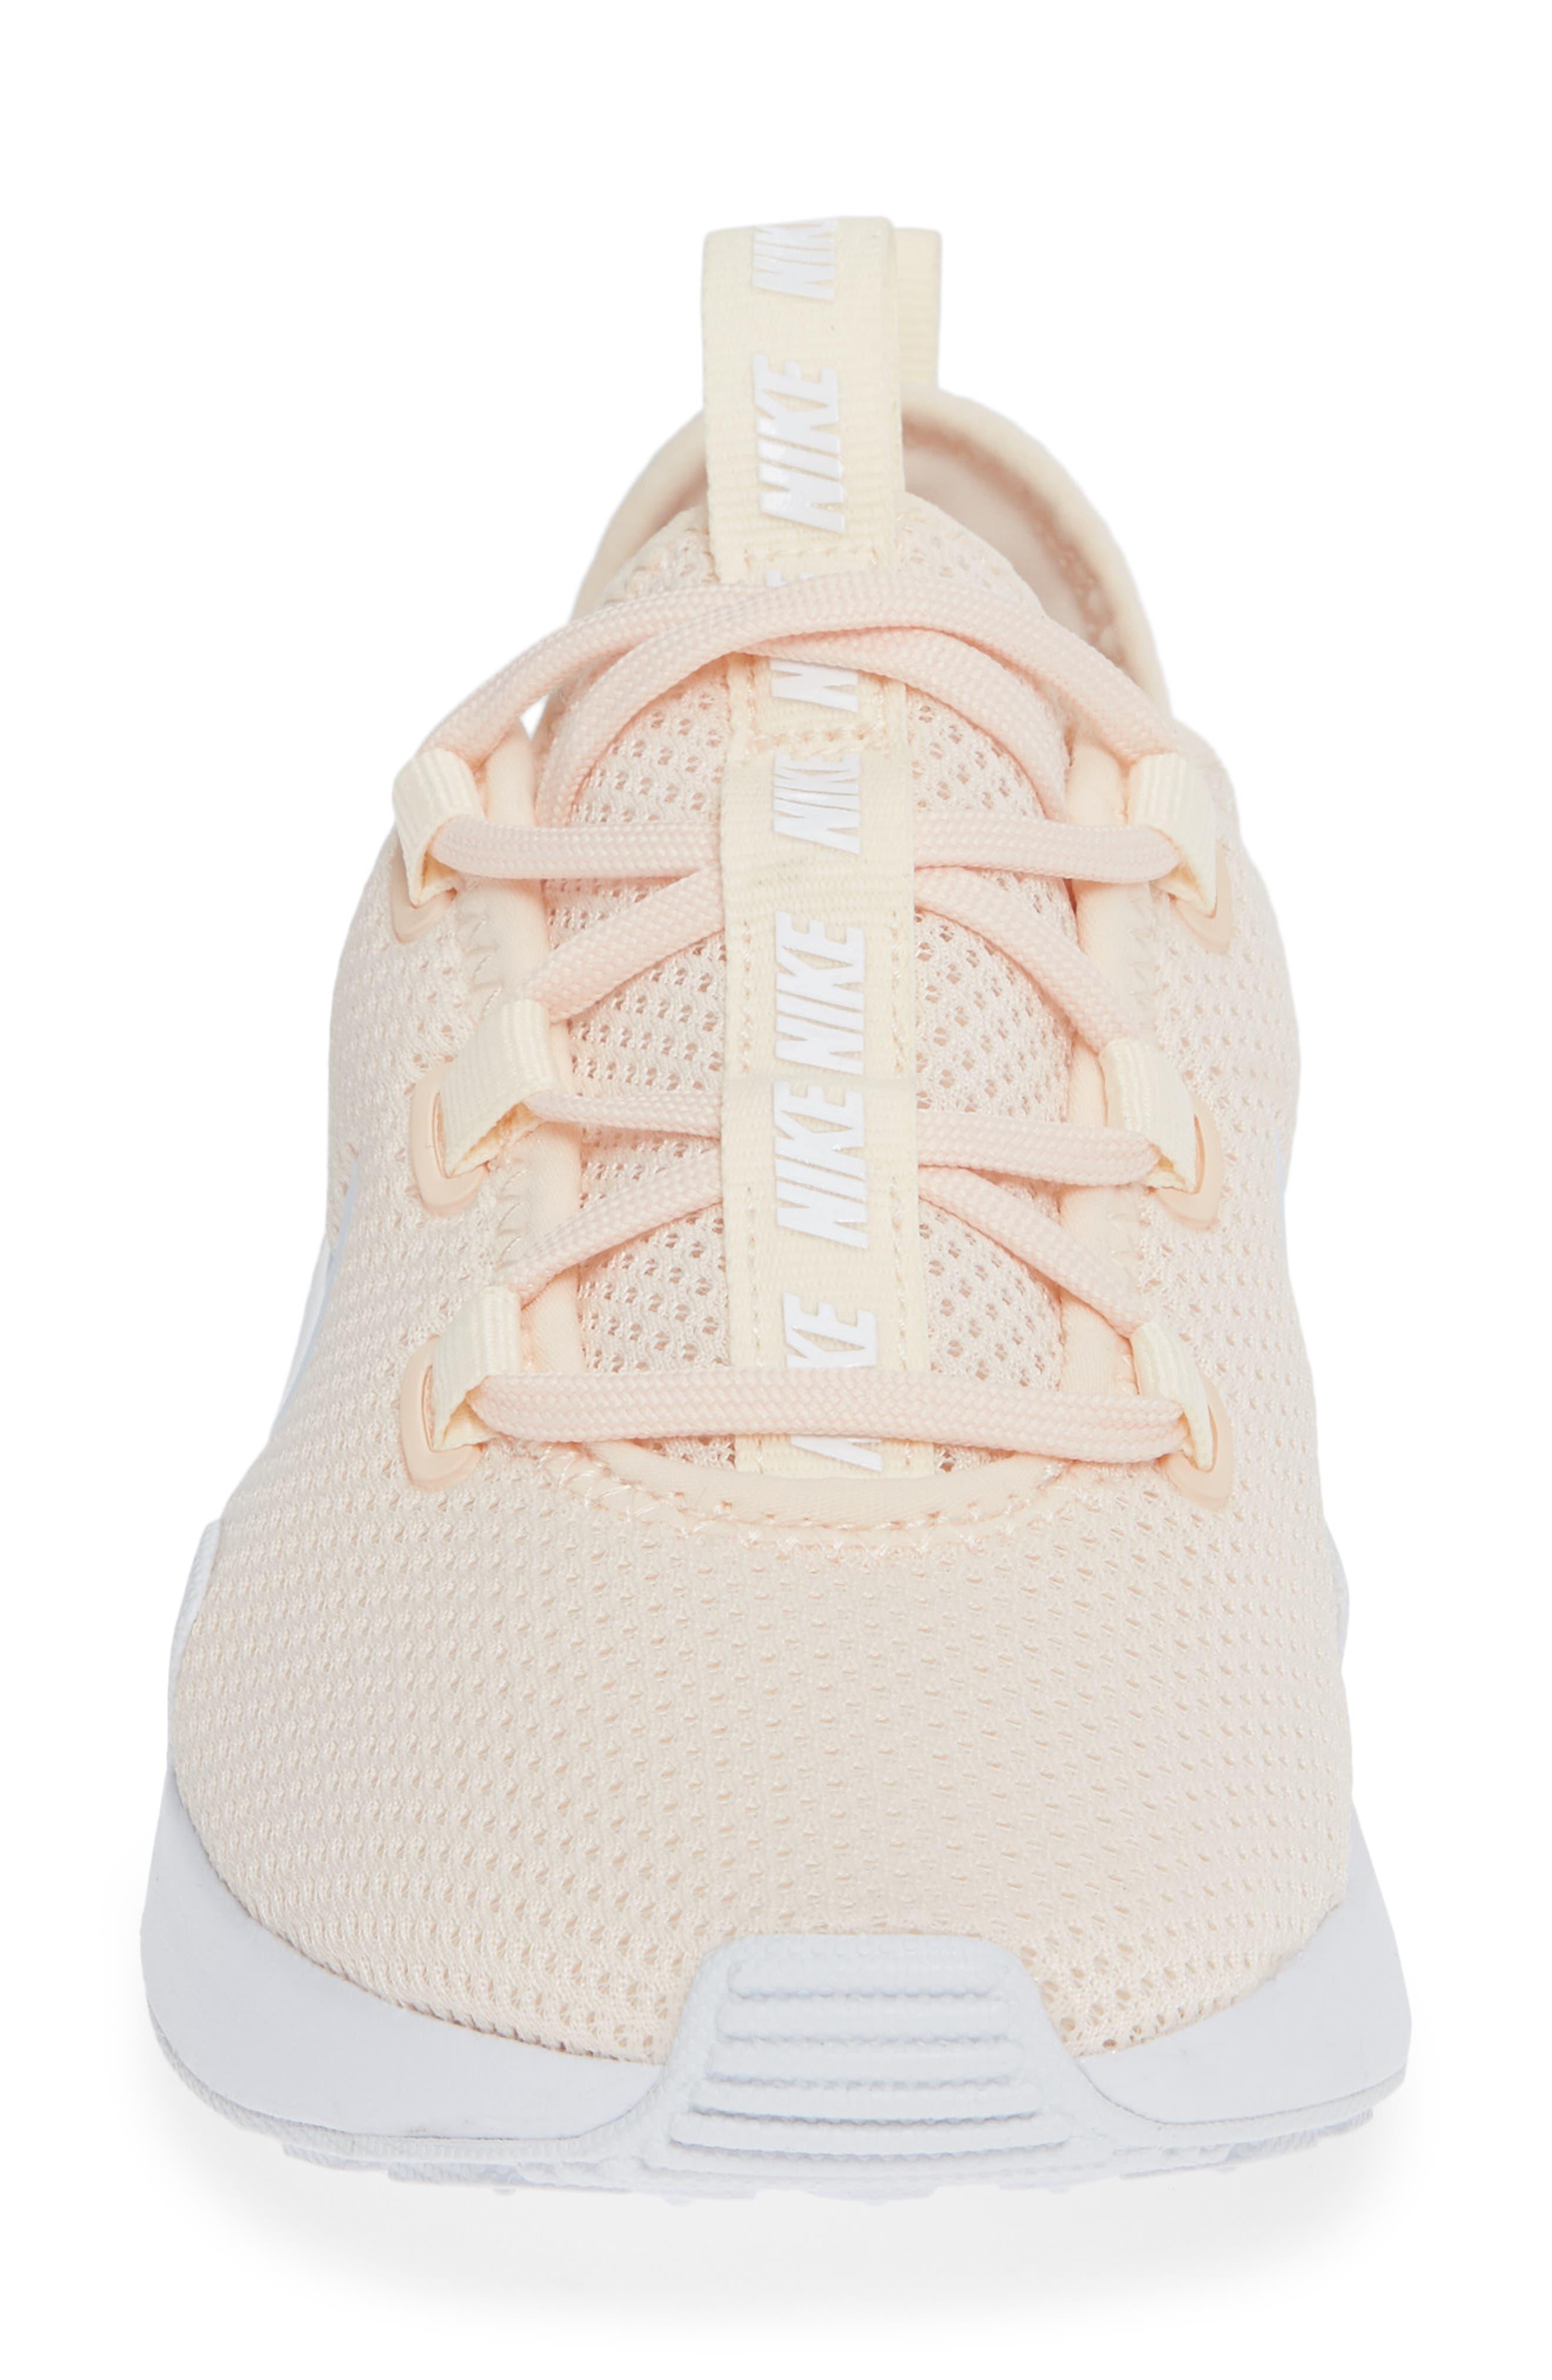 Ashin Modern Shoe,                             Alternate thumbnail 6, color,                             Guava Ice/ White/ White